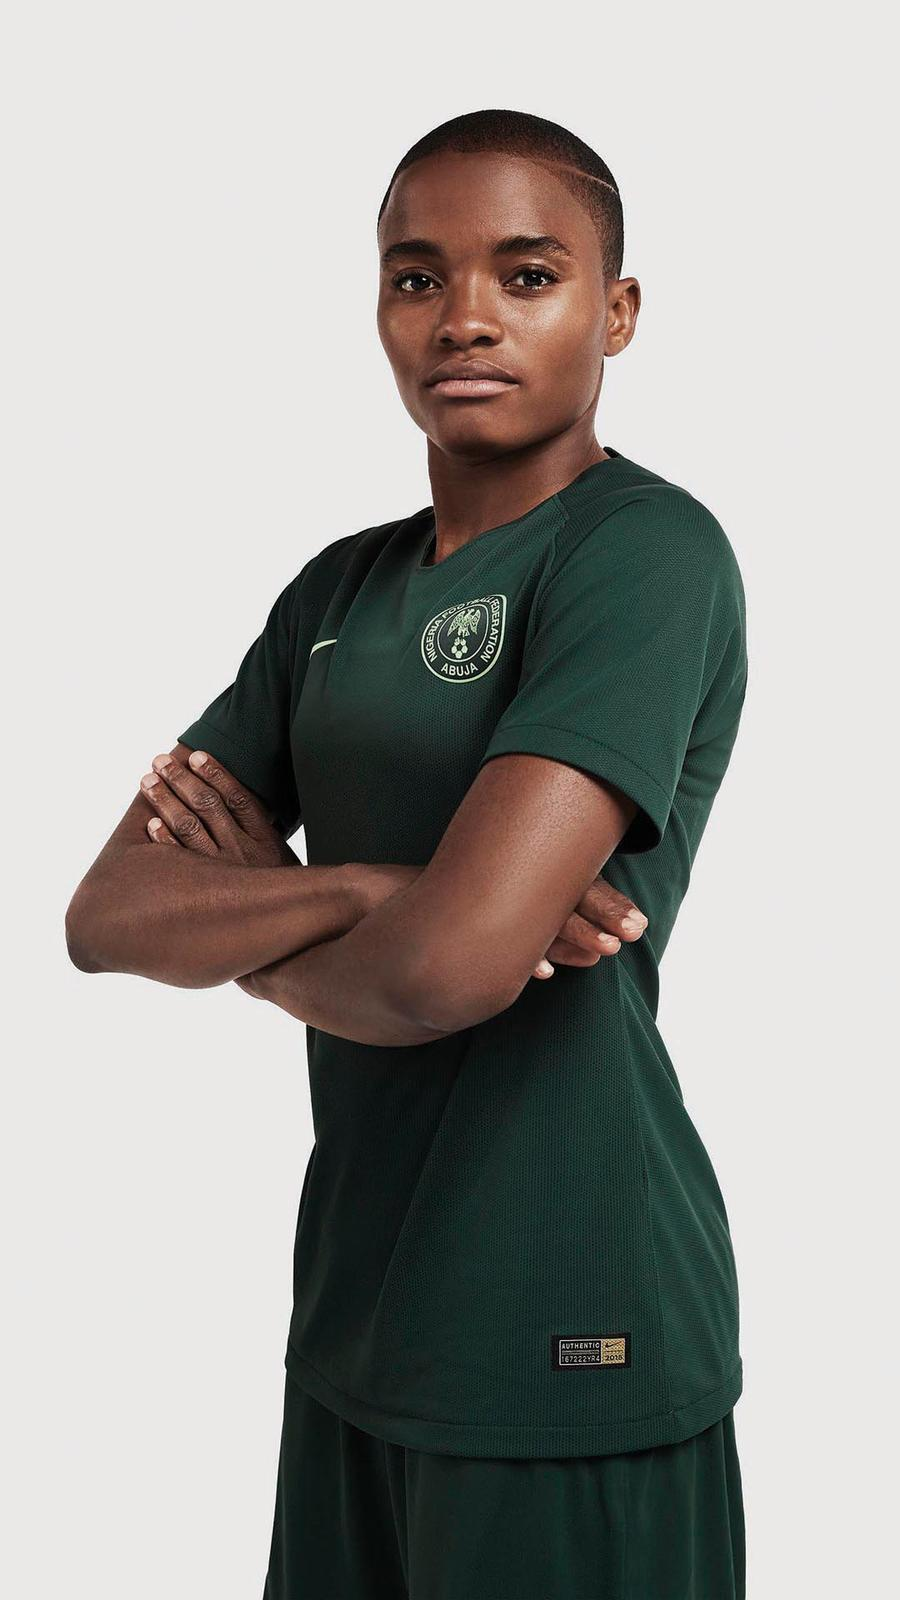 Nike-National-Team-Kit-Nigeria-Away-Portrait_web-rashida-ajibade_86172.jpg